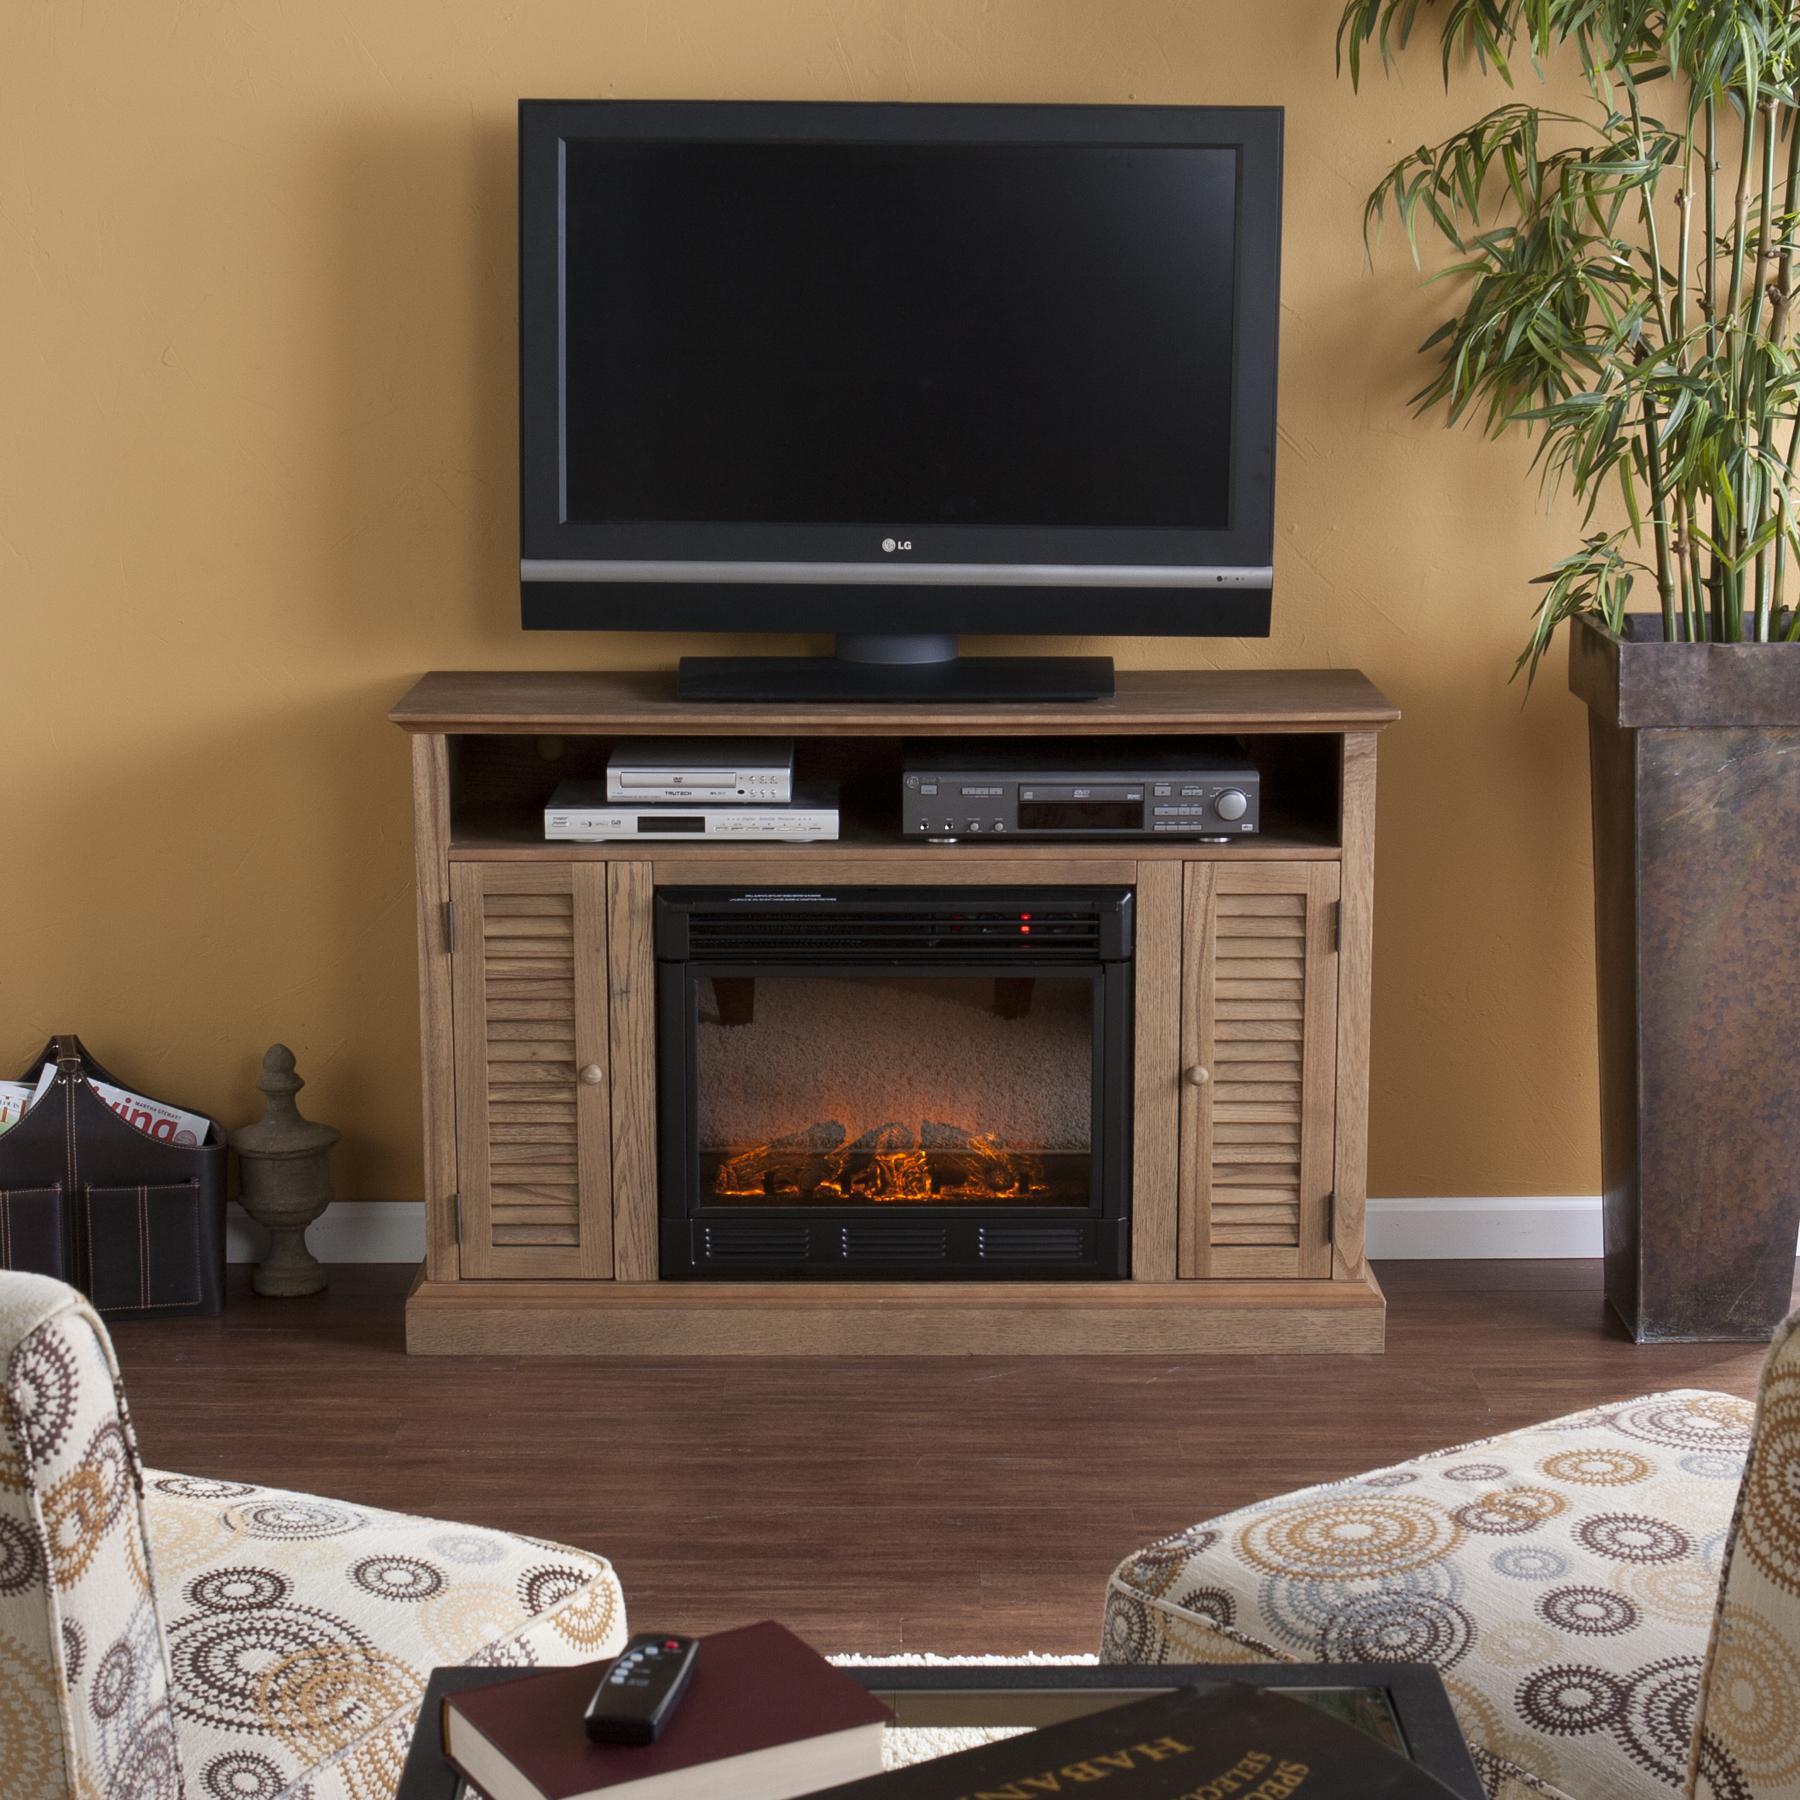 Holly & Martin™ Savannah Media Electric Fireplace